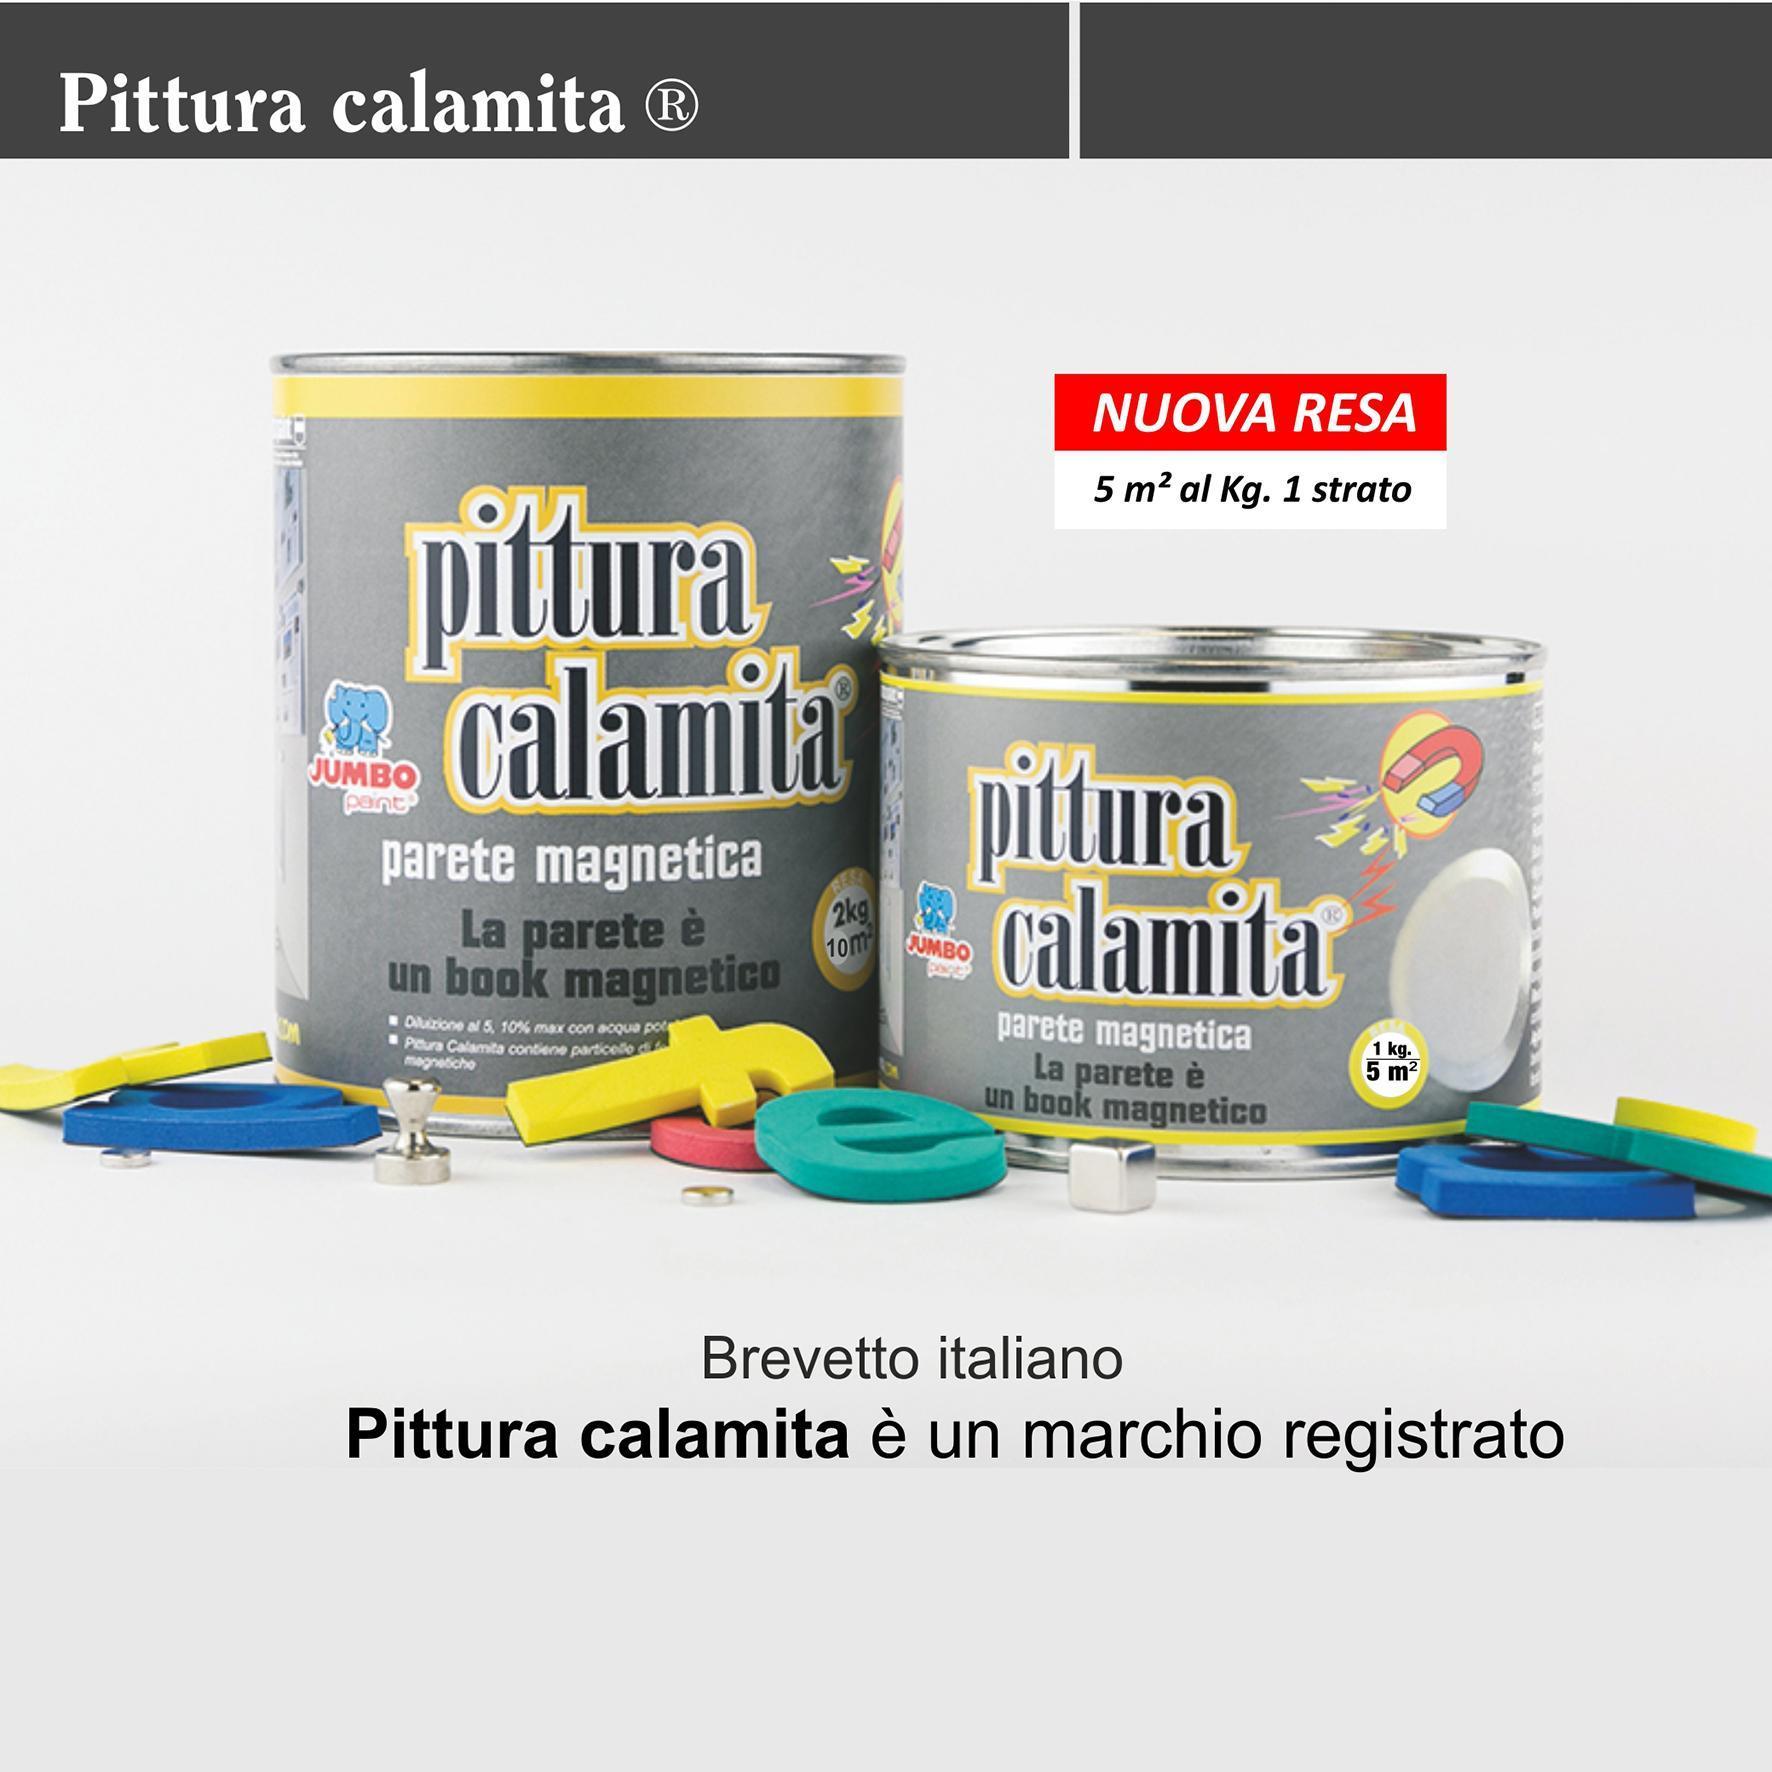 Vernice Lavagna Magnetica Colorata pittura calamita ®